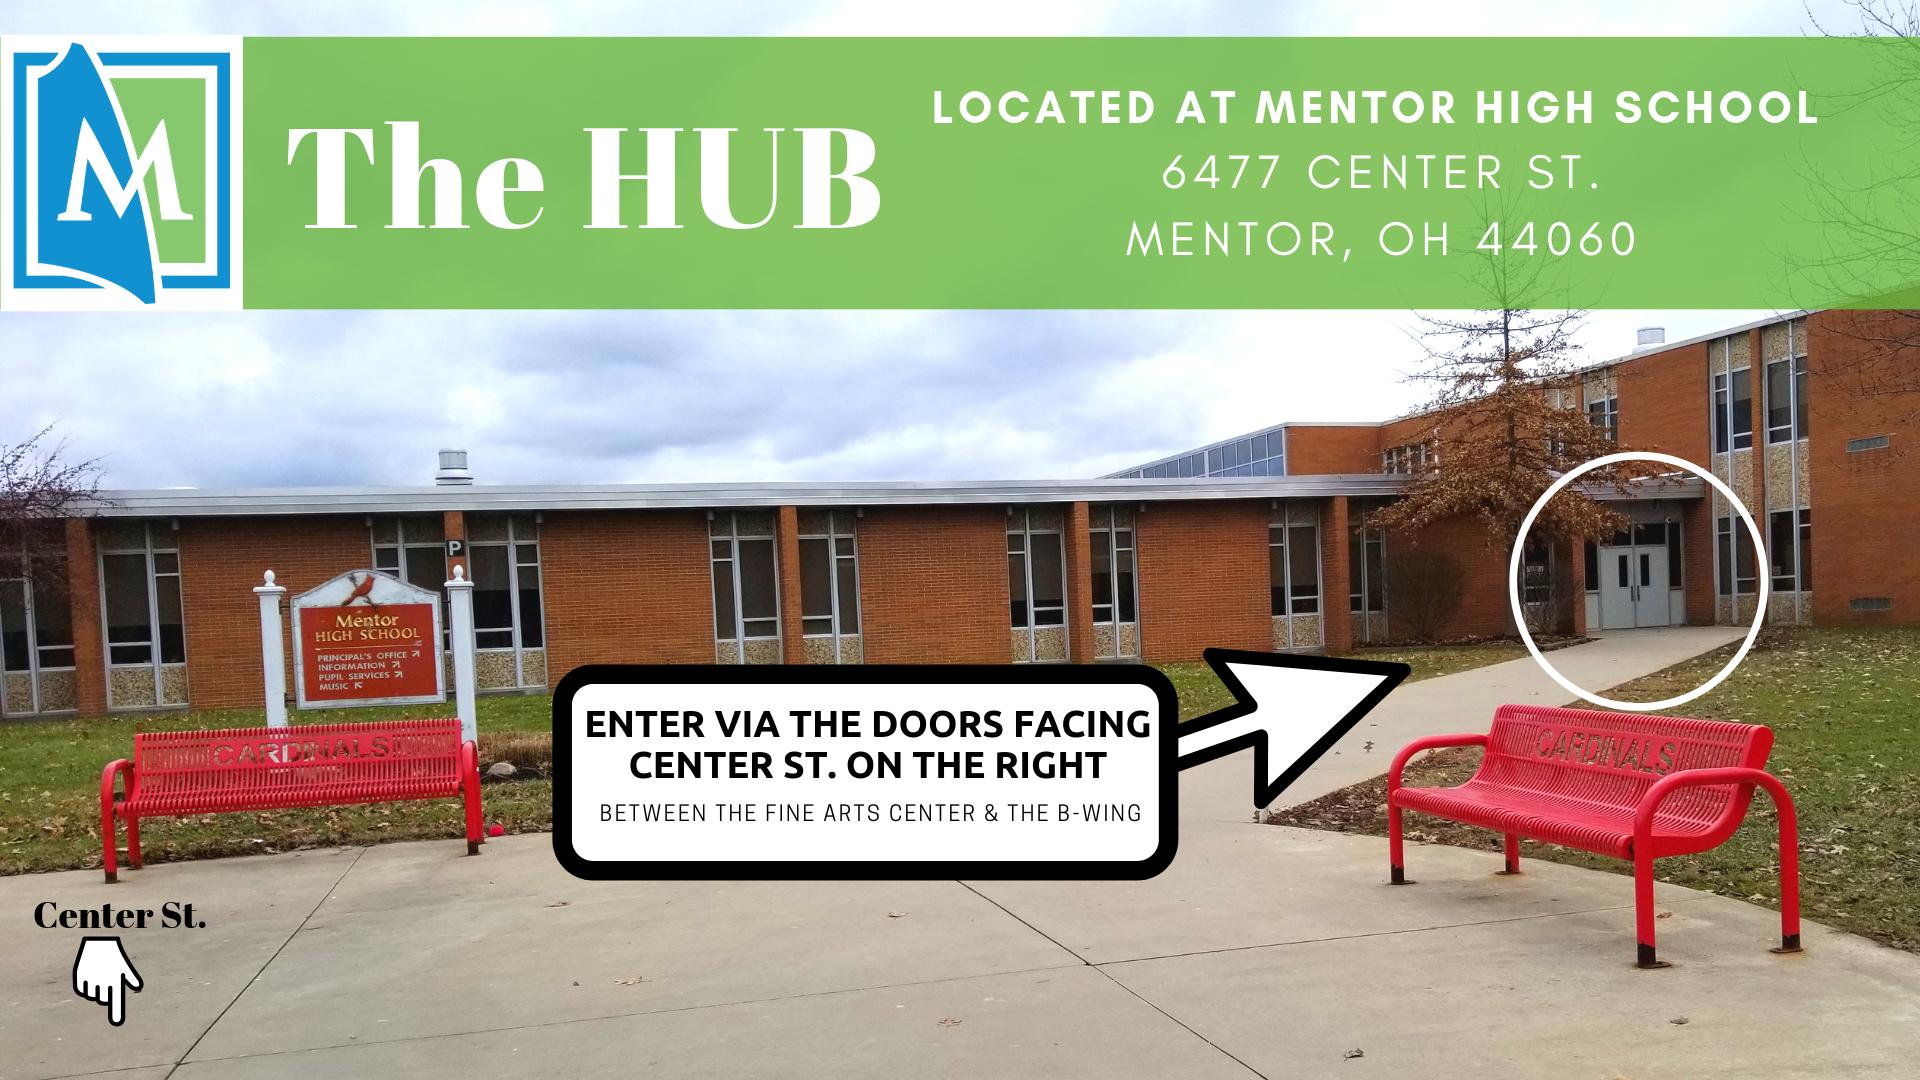 Image of the HUB entrance